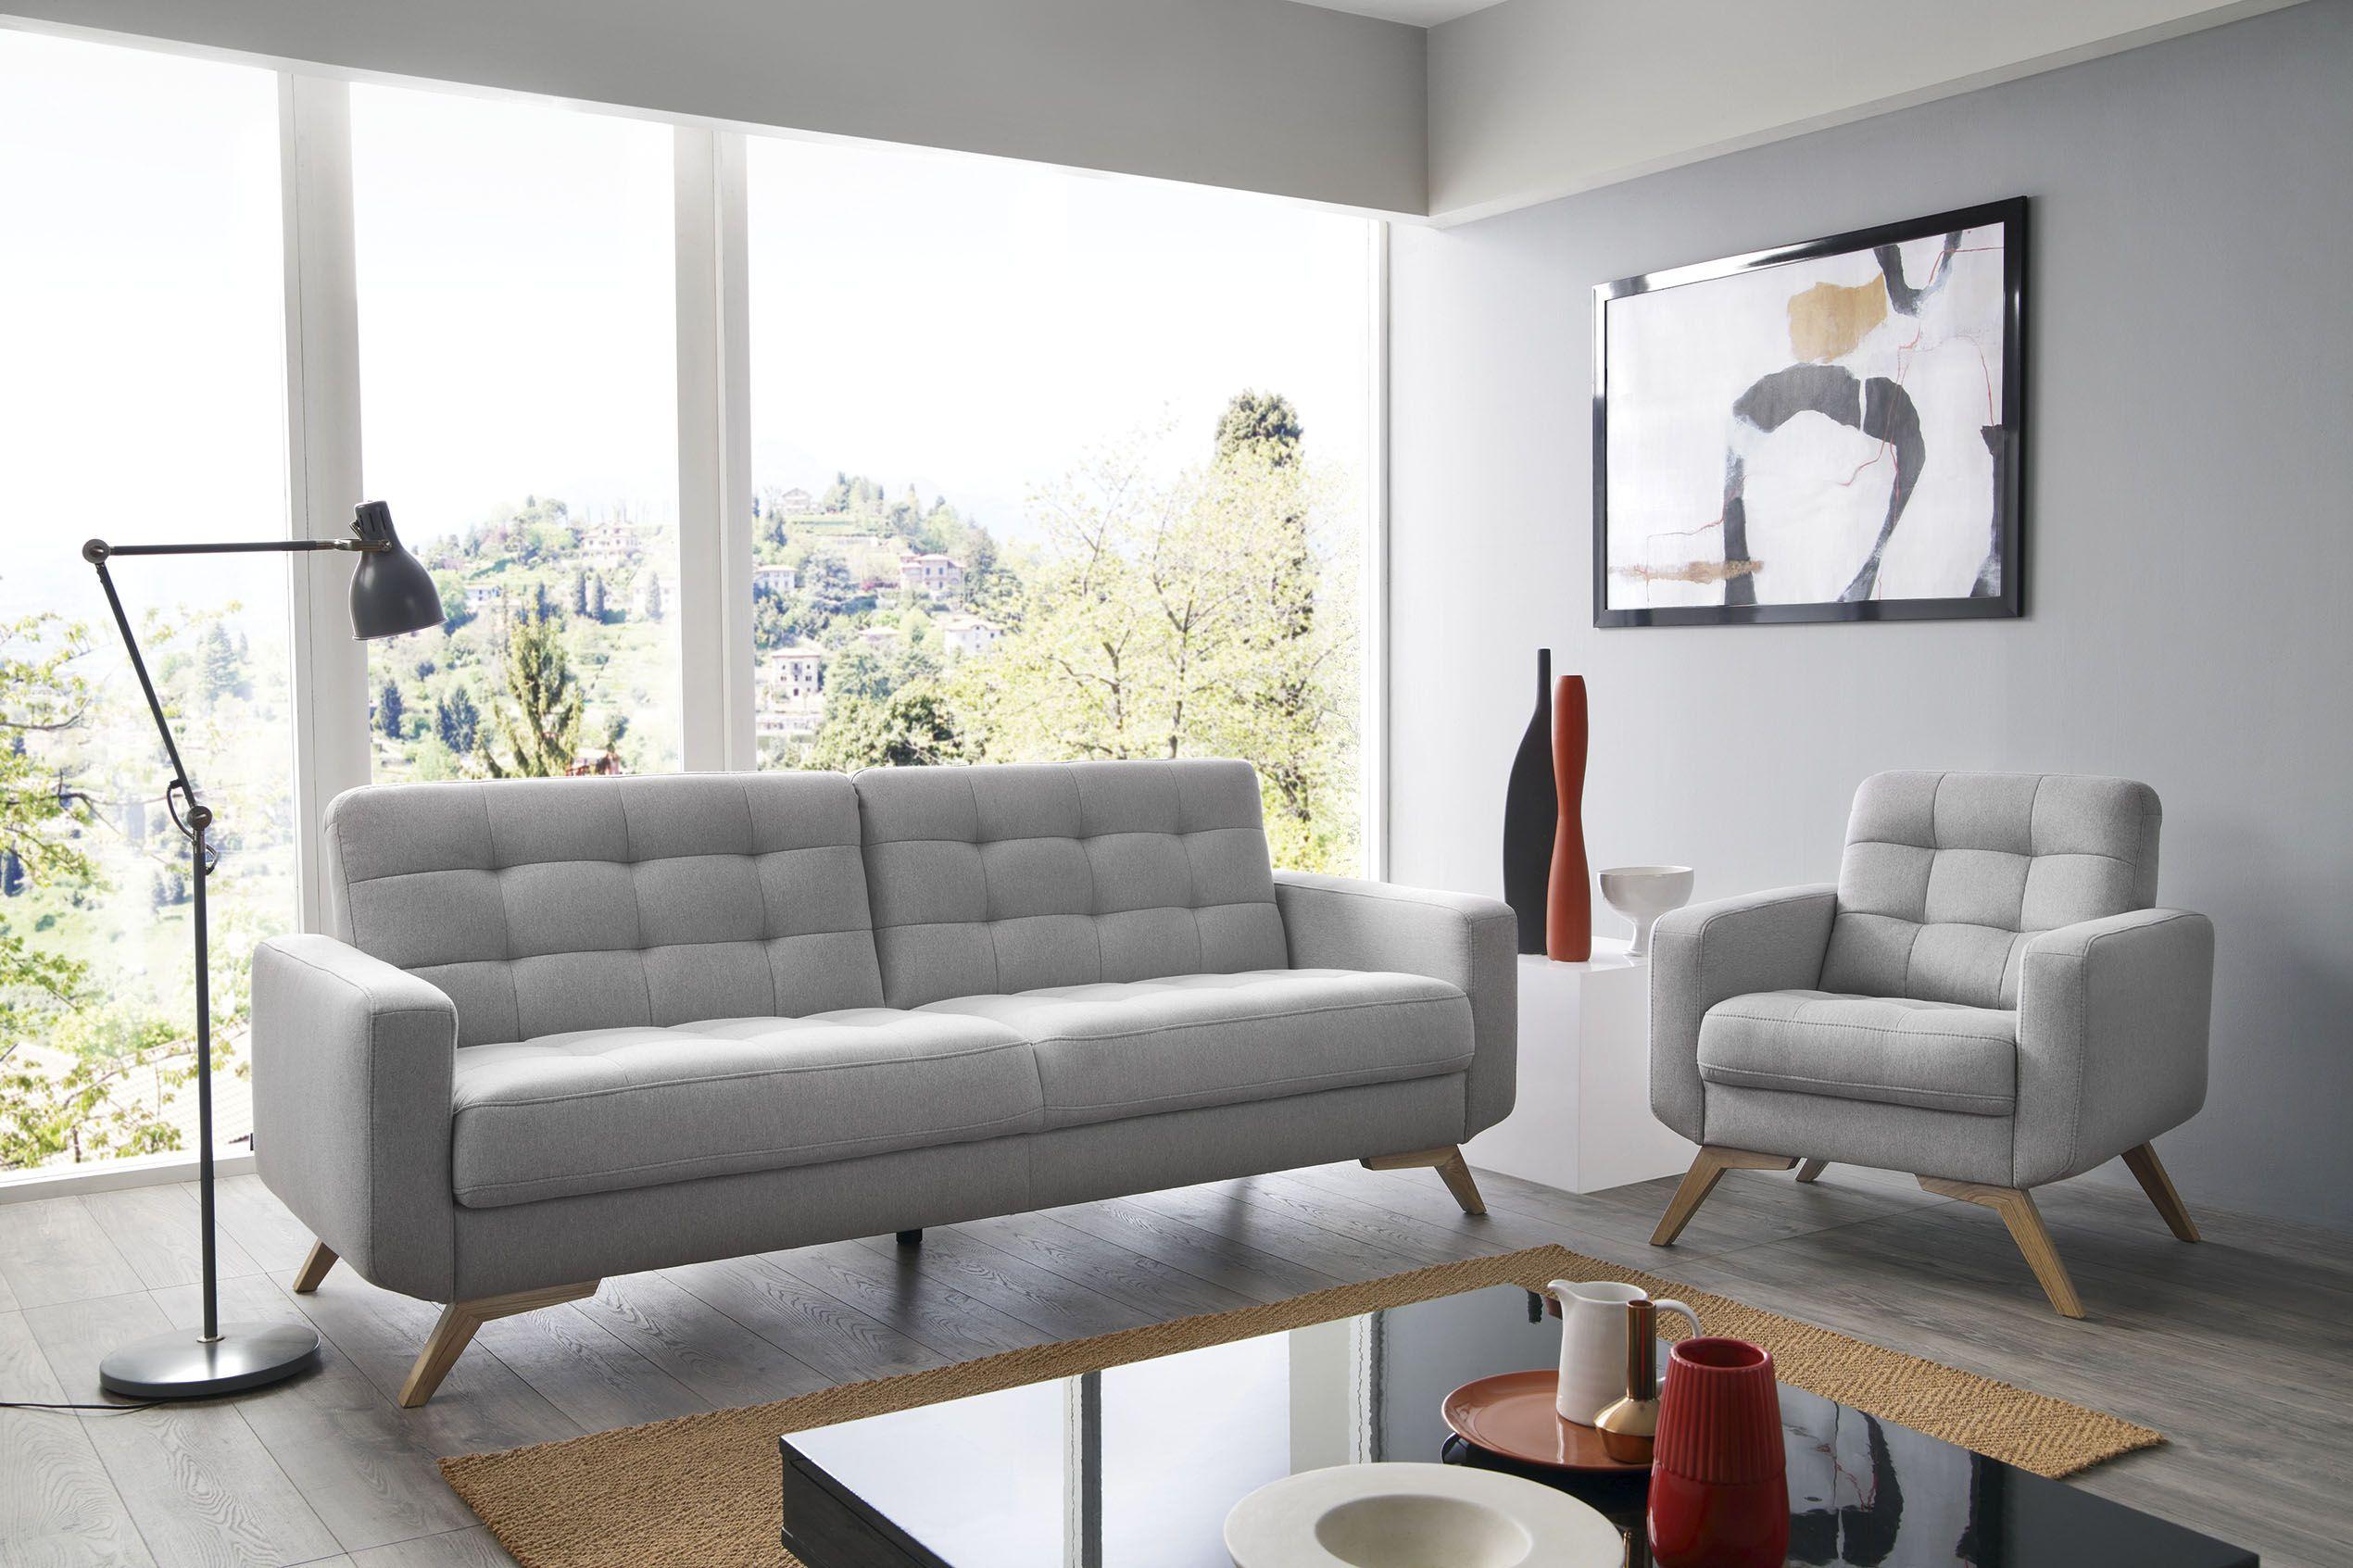 Sofa Kanapa Szara Designerska Fiord Sweet Sit Furniture Home Decor Sofa